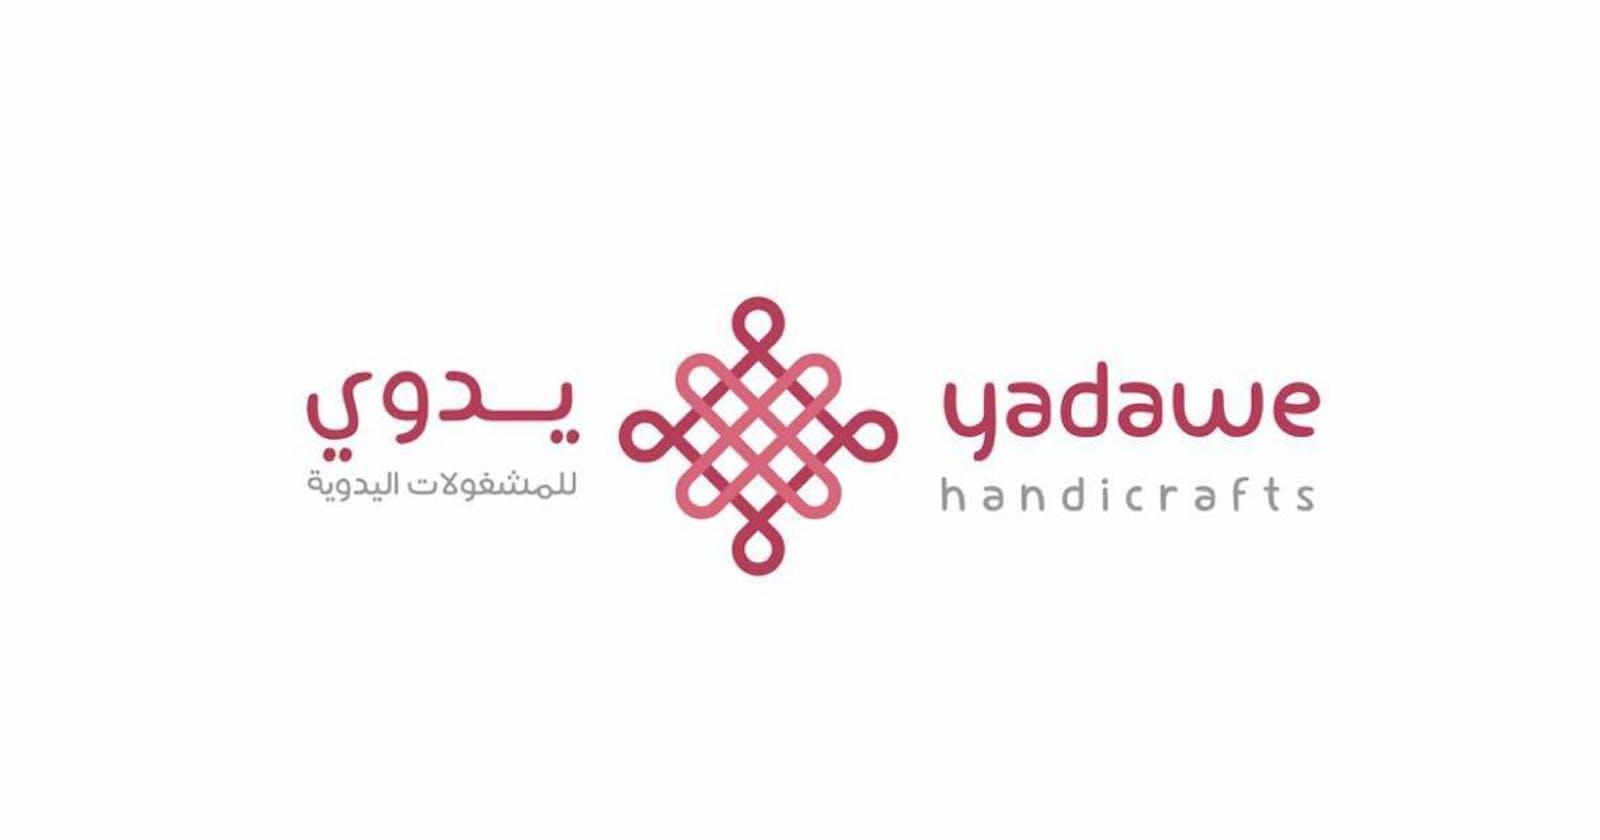 Yadawe.com is old news